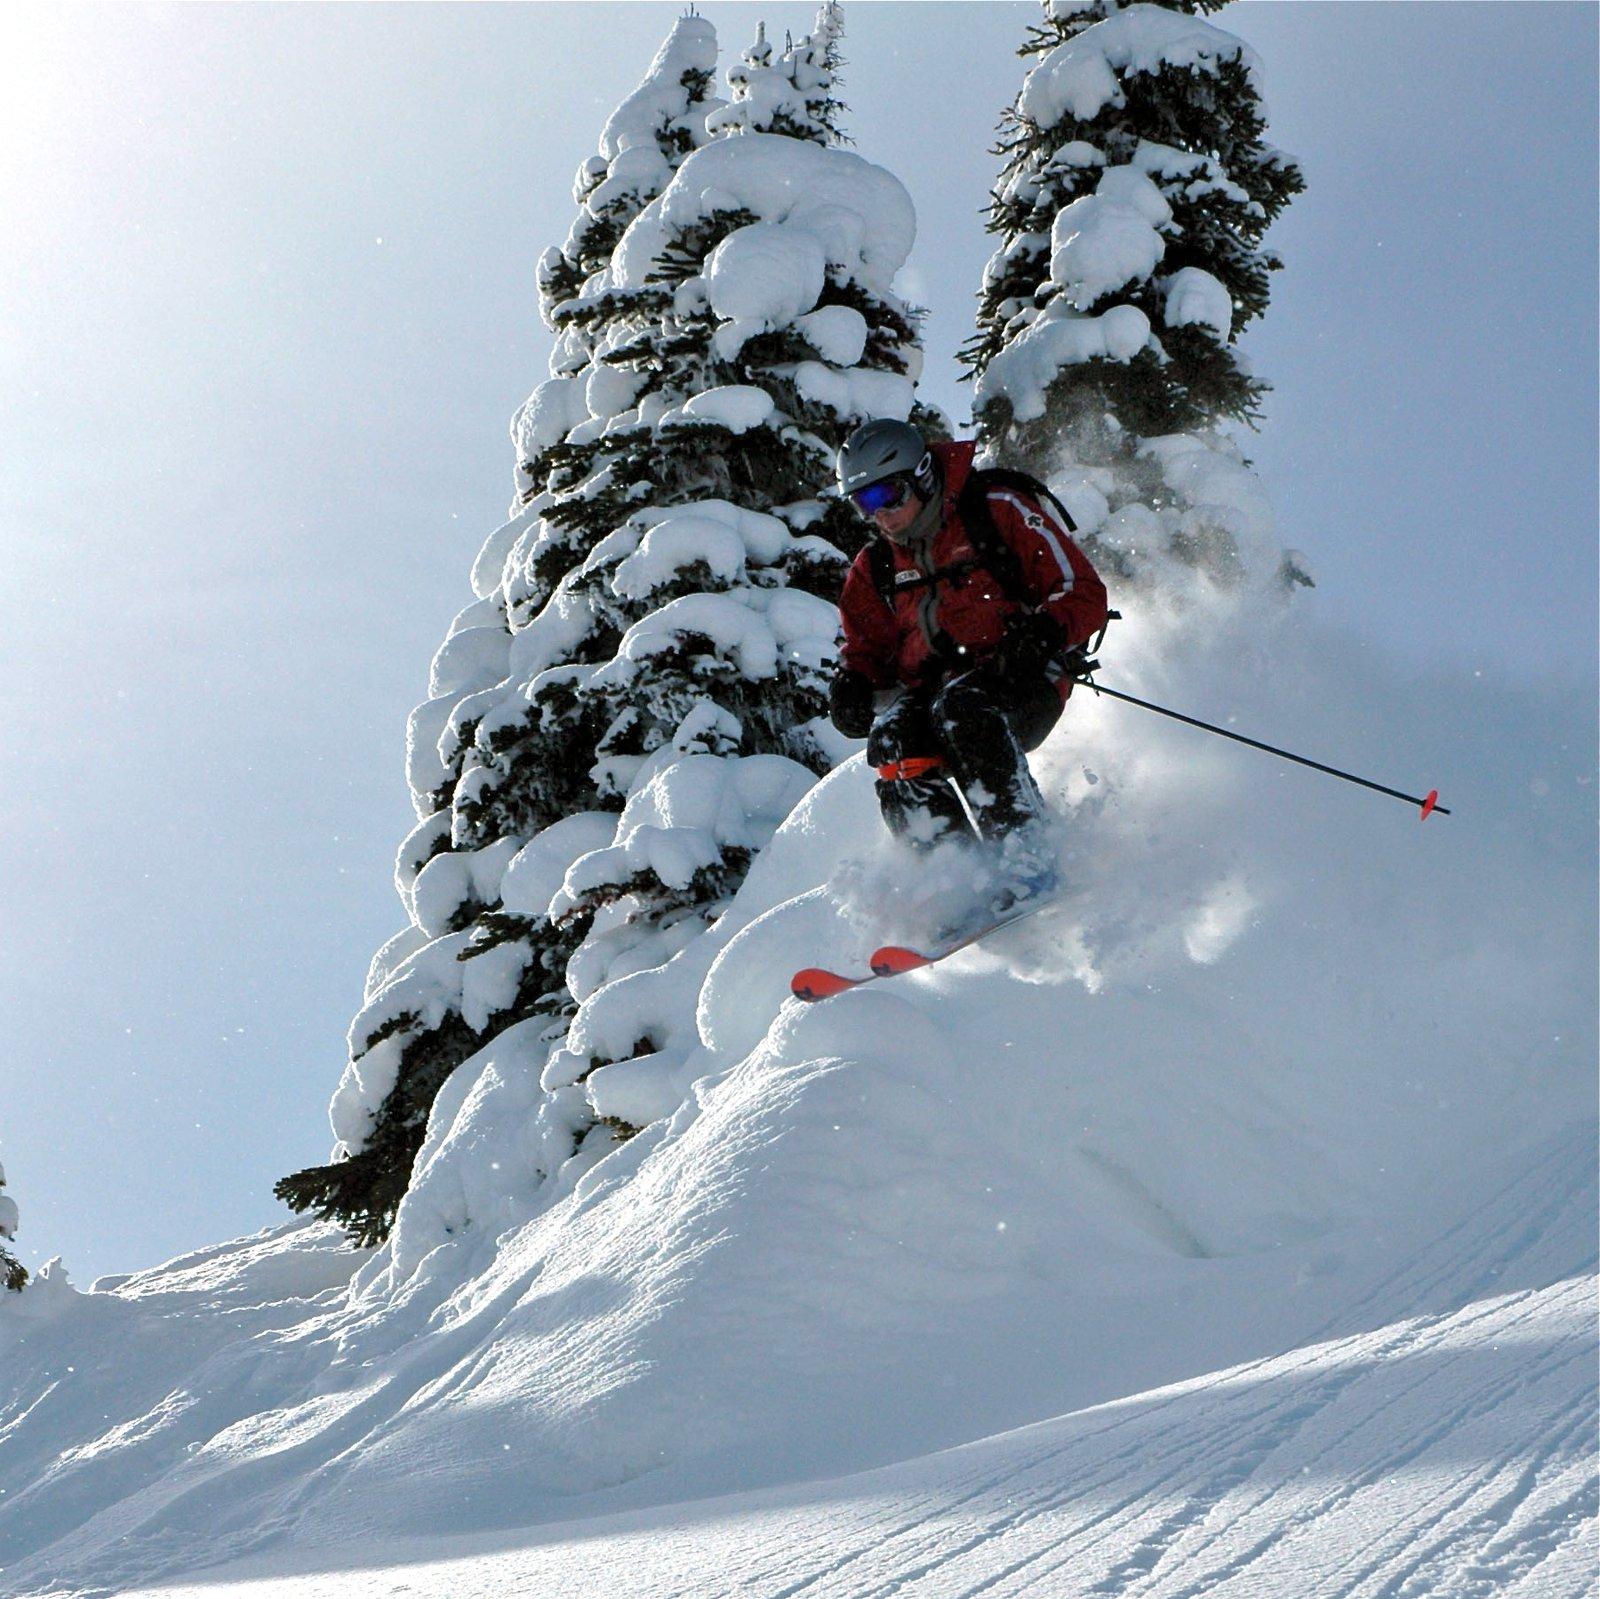 Skiing in the Monashees